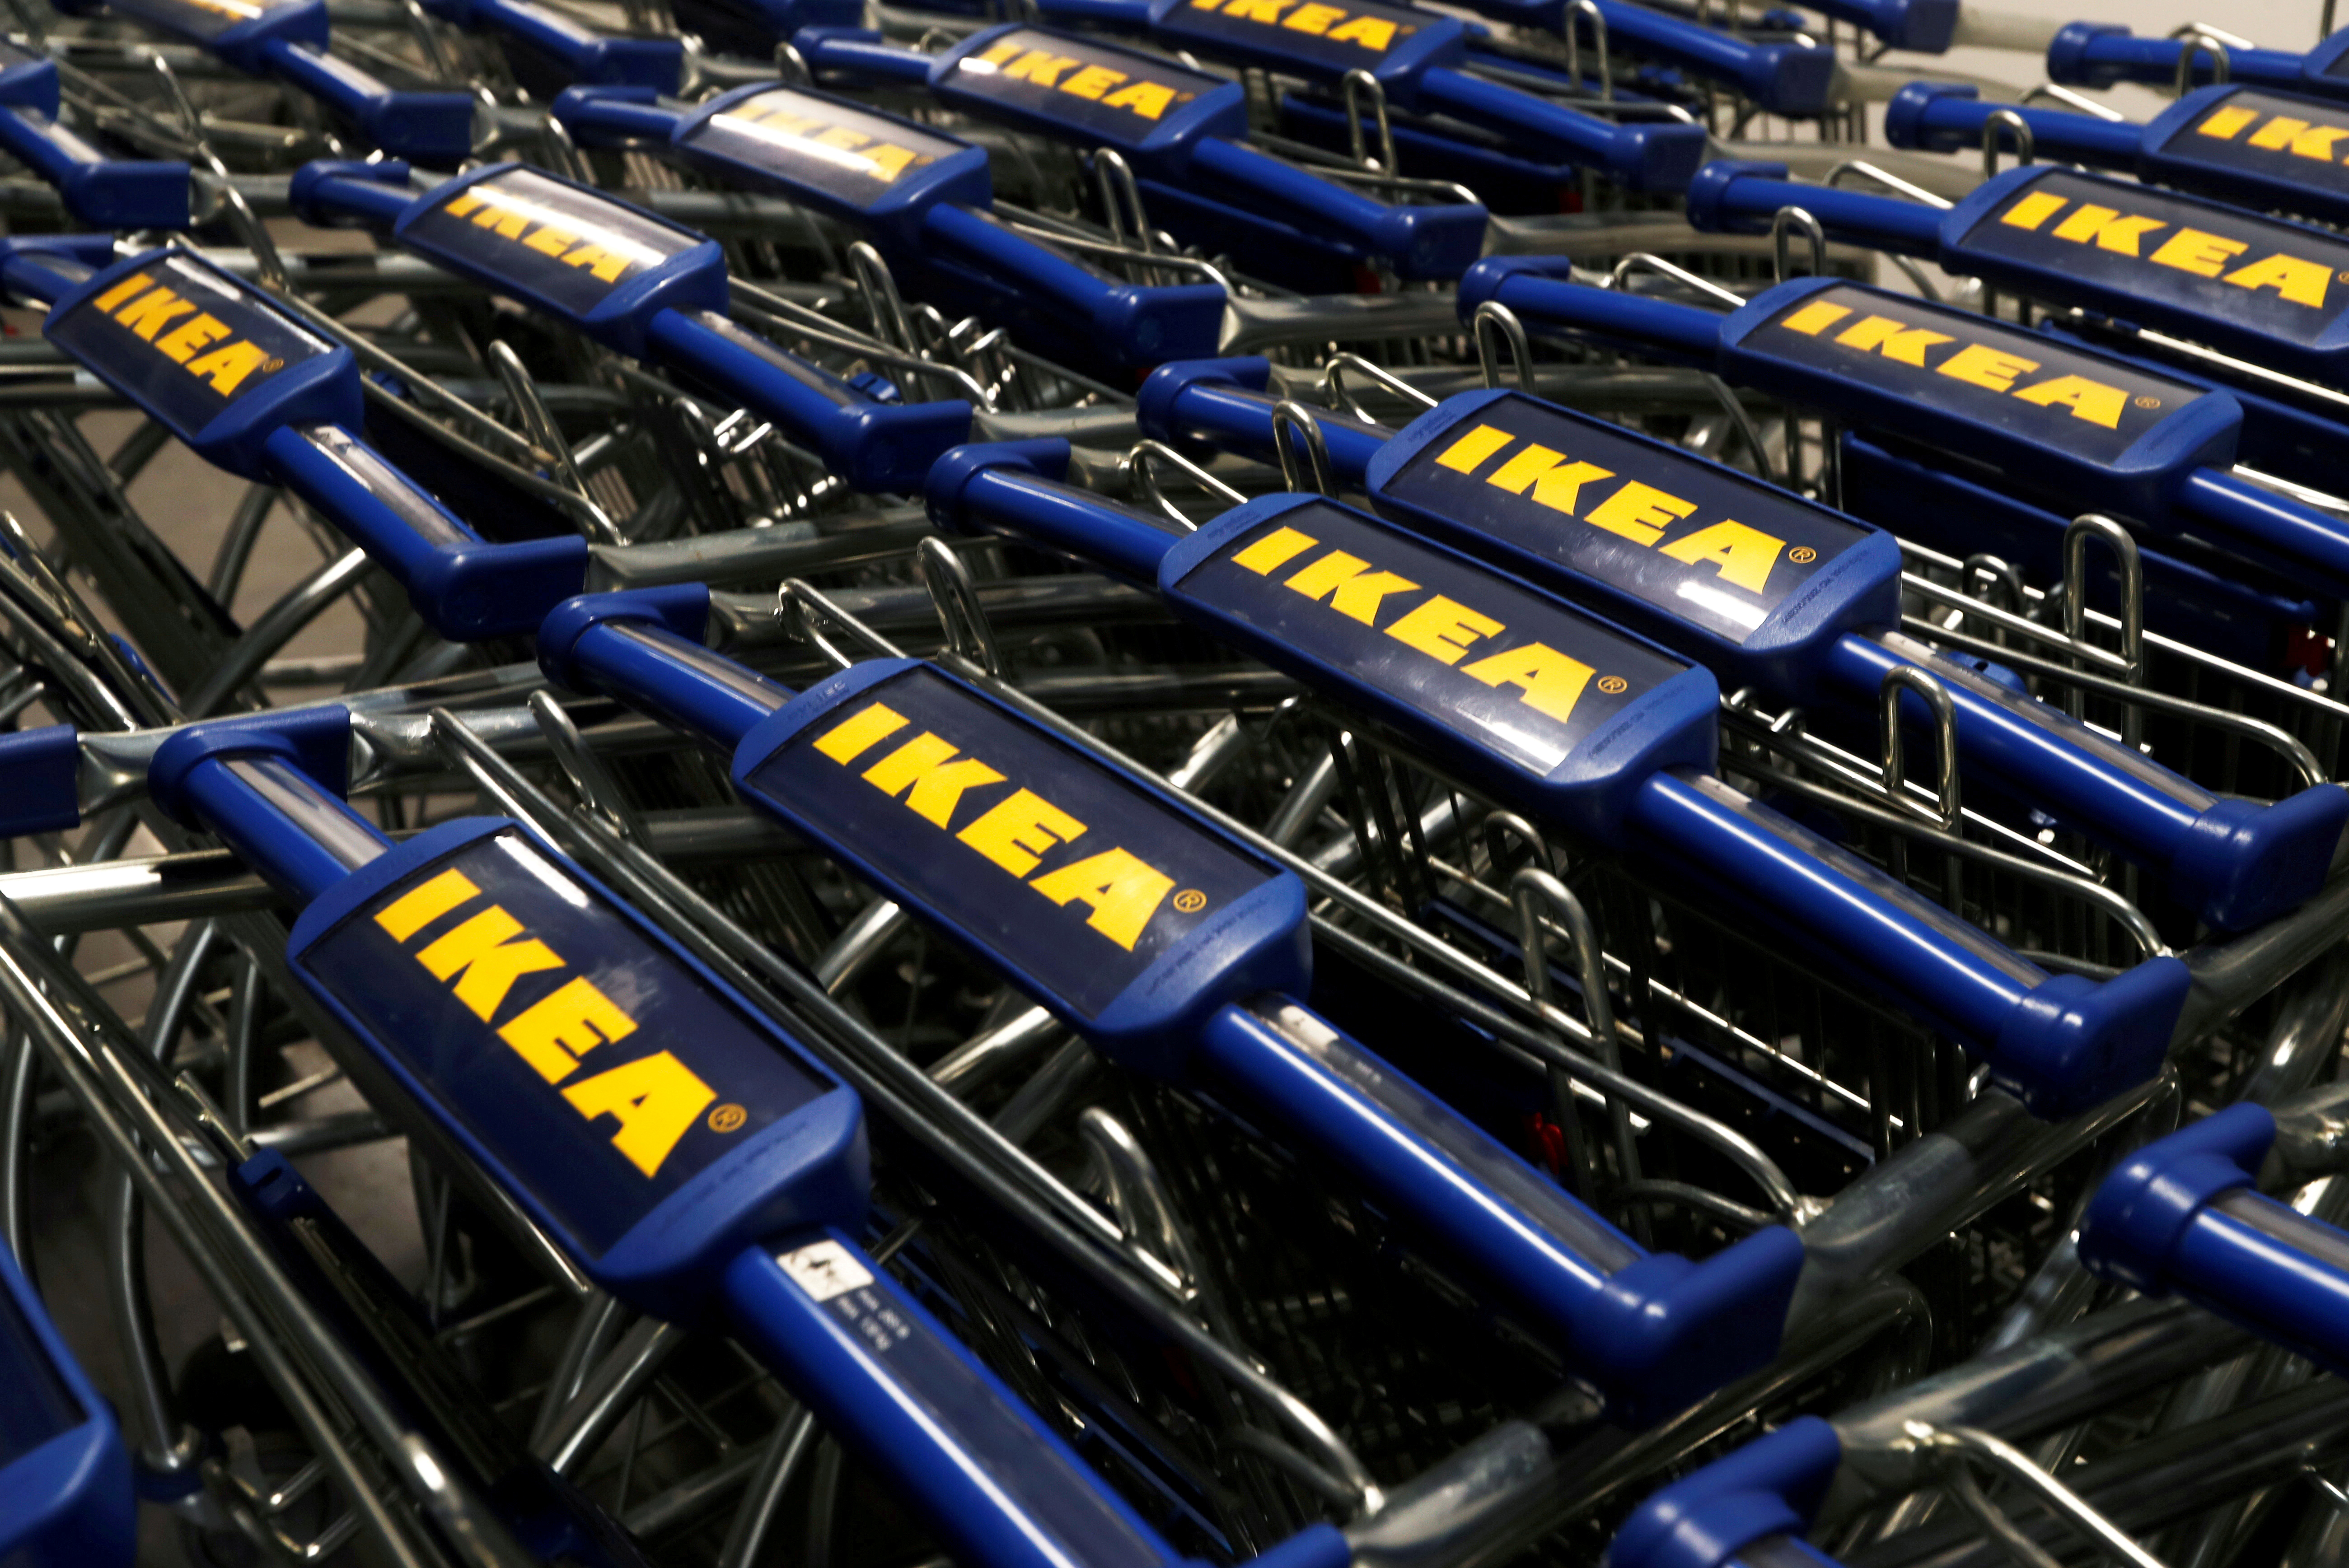 The IKEA logo is seen on shopping carts inside an IKEA store in Navi Mumbai, India, December 17, 2020. REUTERS/Francis Mascarenhas//File Photo